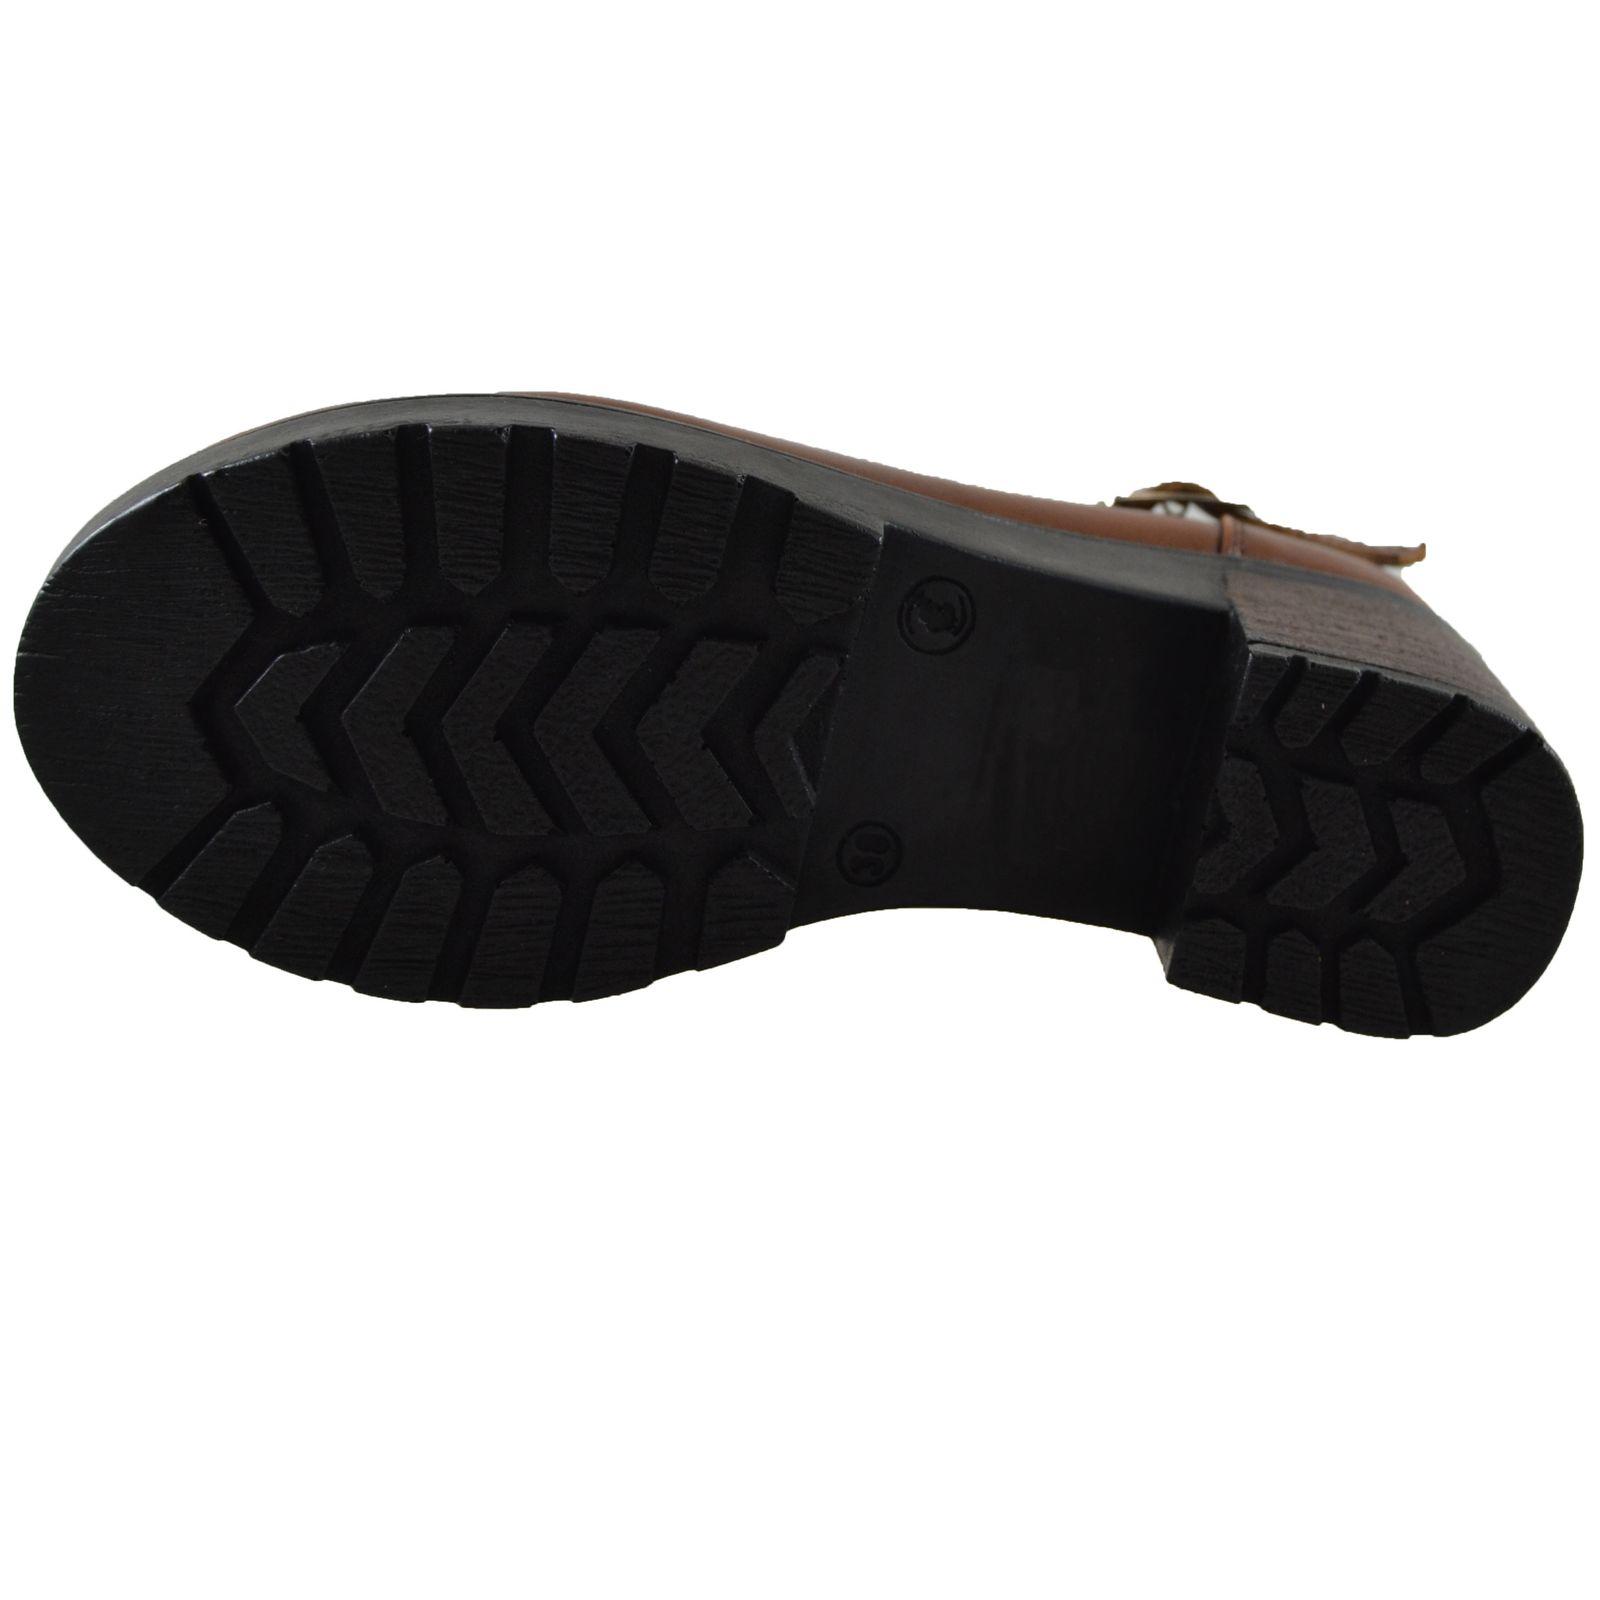 کفش زنانه کد 461 -  - 6